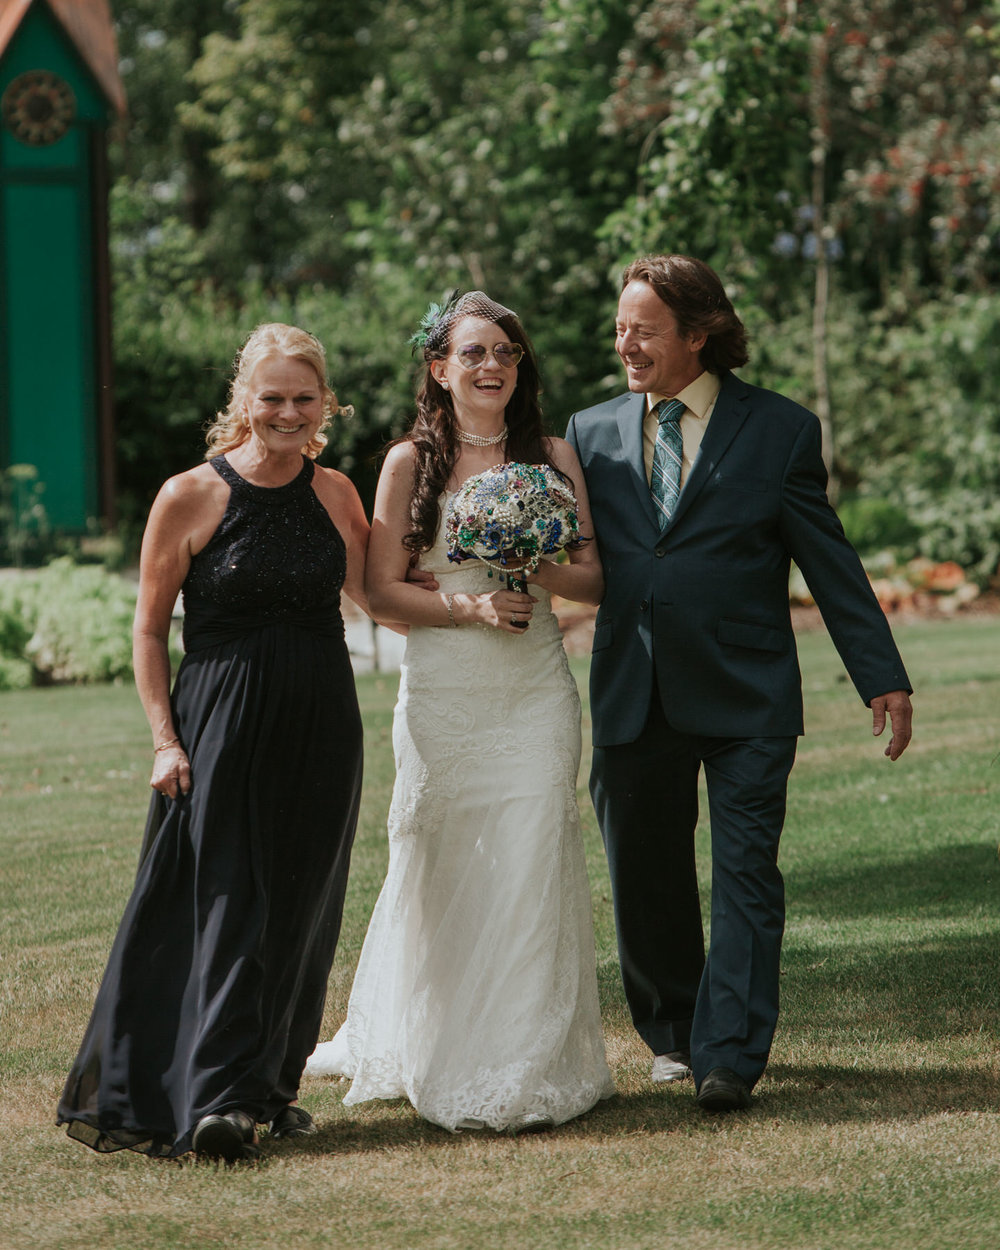 Vancouver Wedding Photographer Pam (22).jpg